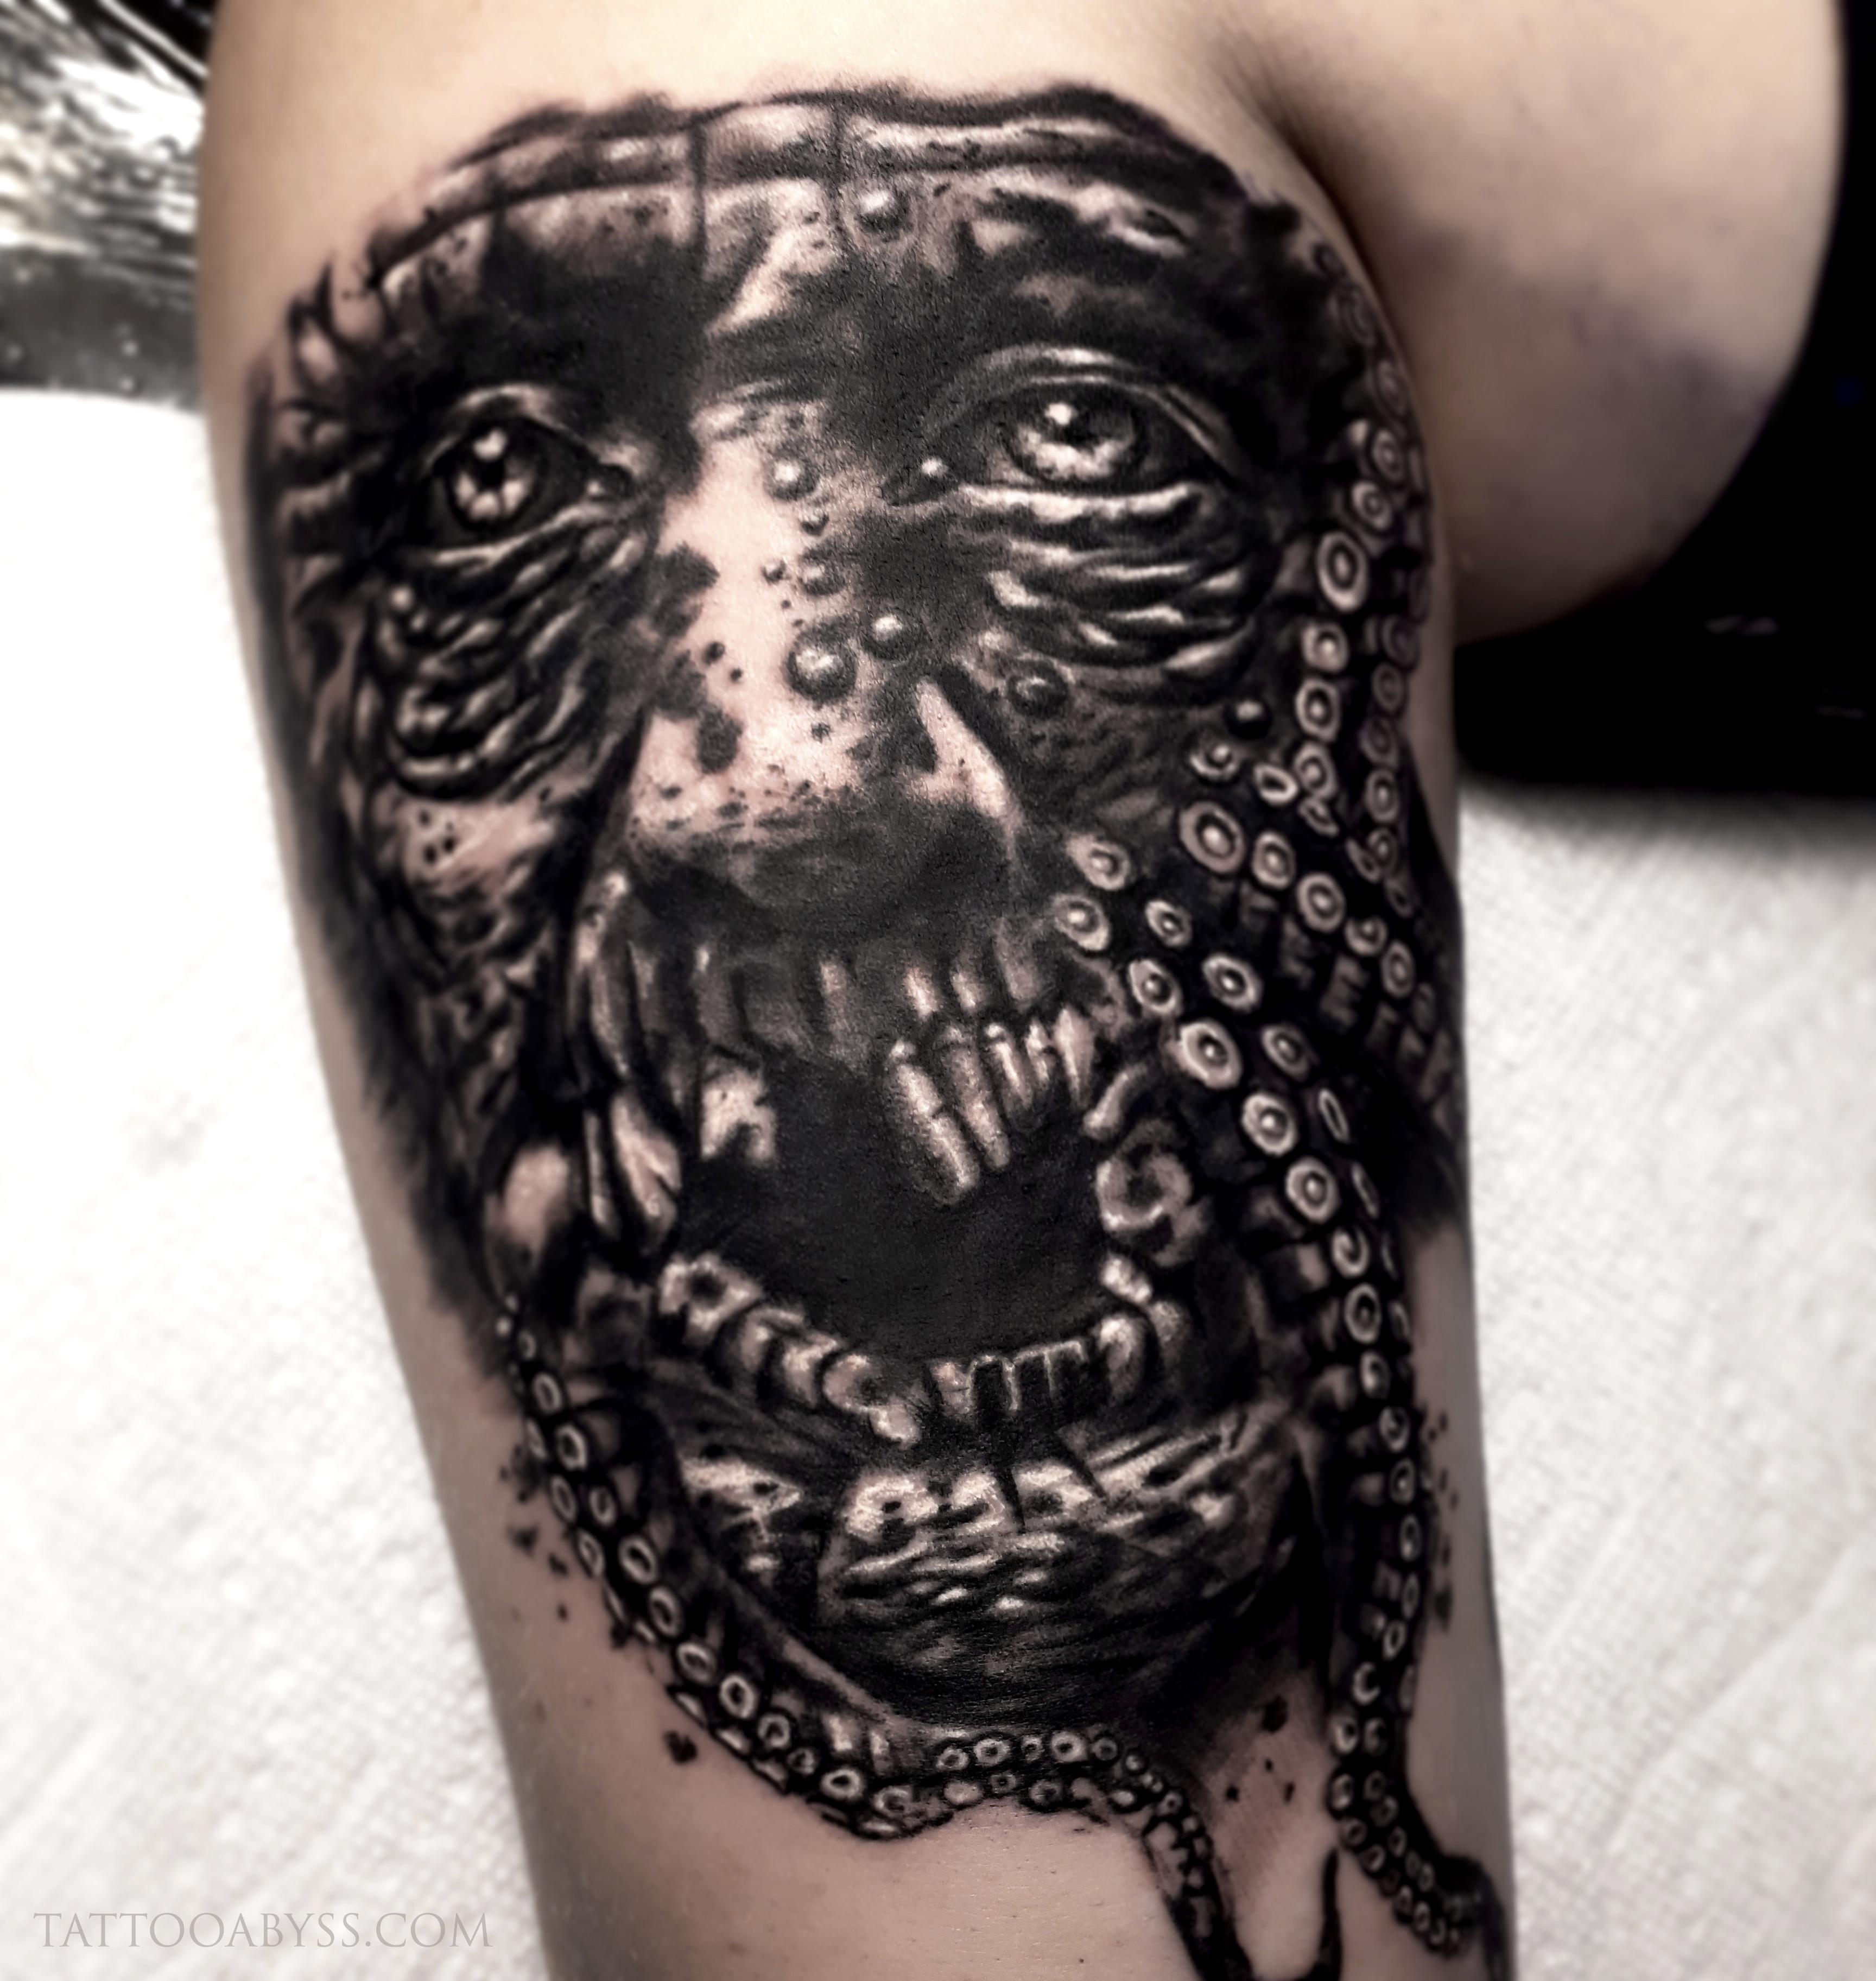 aquatic-demon-loudevick-tattoo-abyss